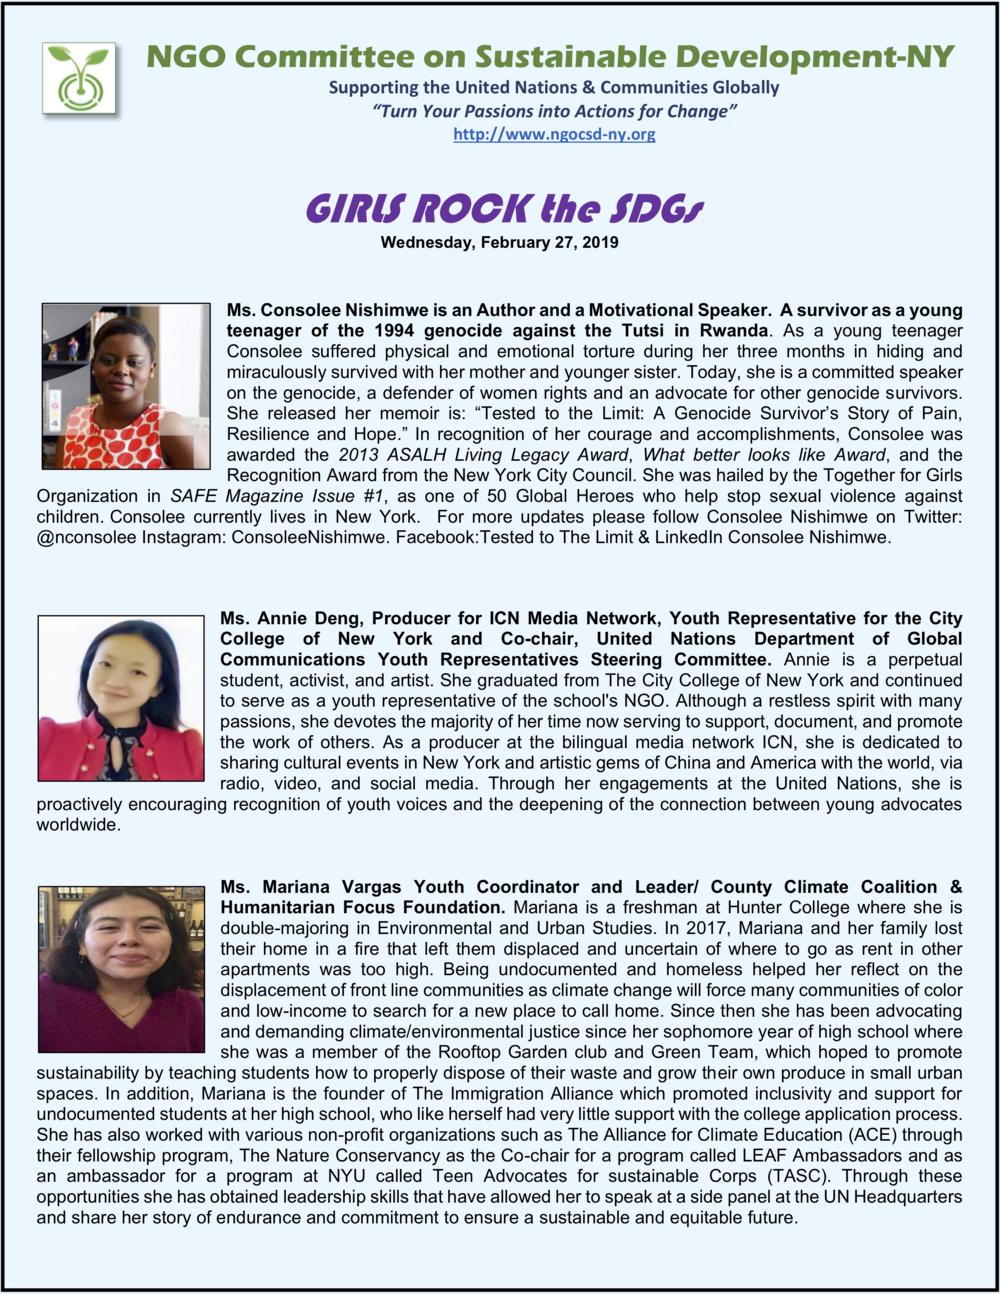 NGOCSD-NY 2-27-19 GIRLS ROCK the SDGs Photo-Bios A2.png